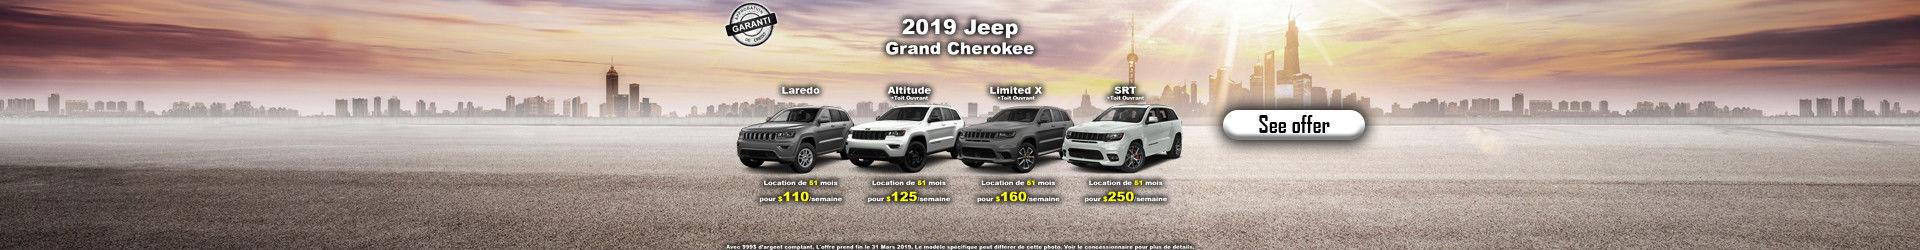 Promo Grand Cherokees